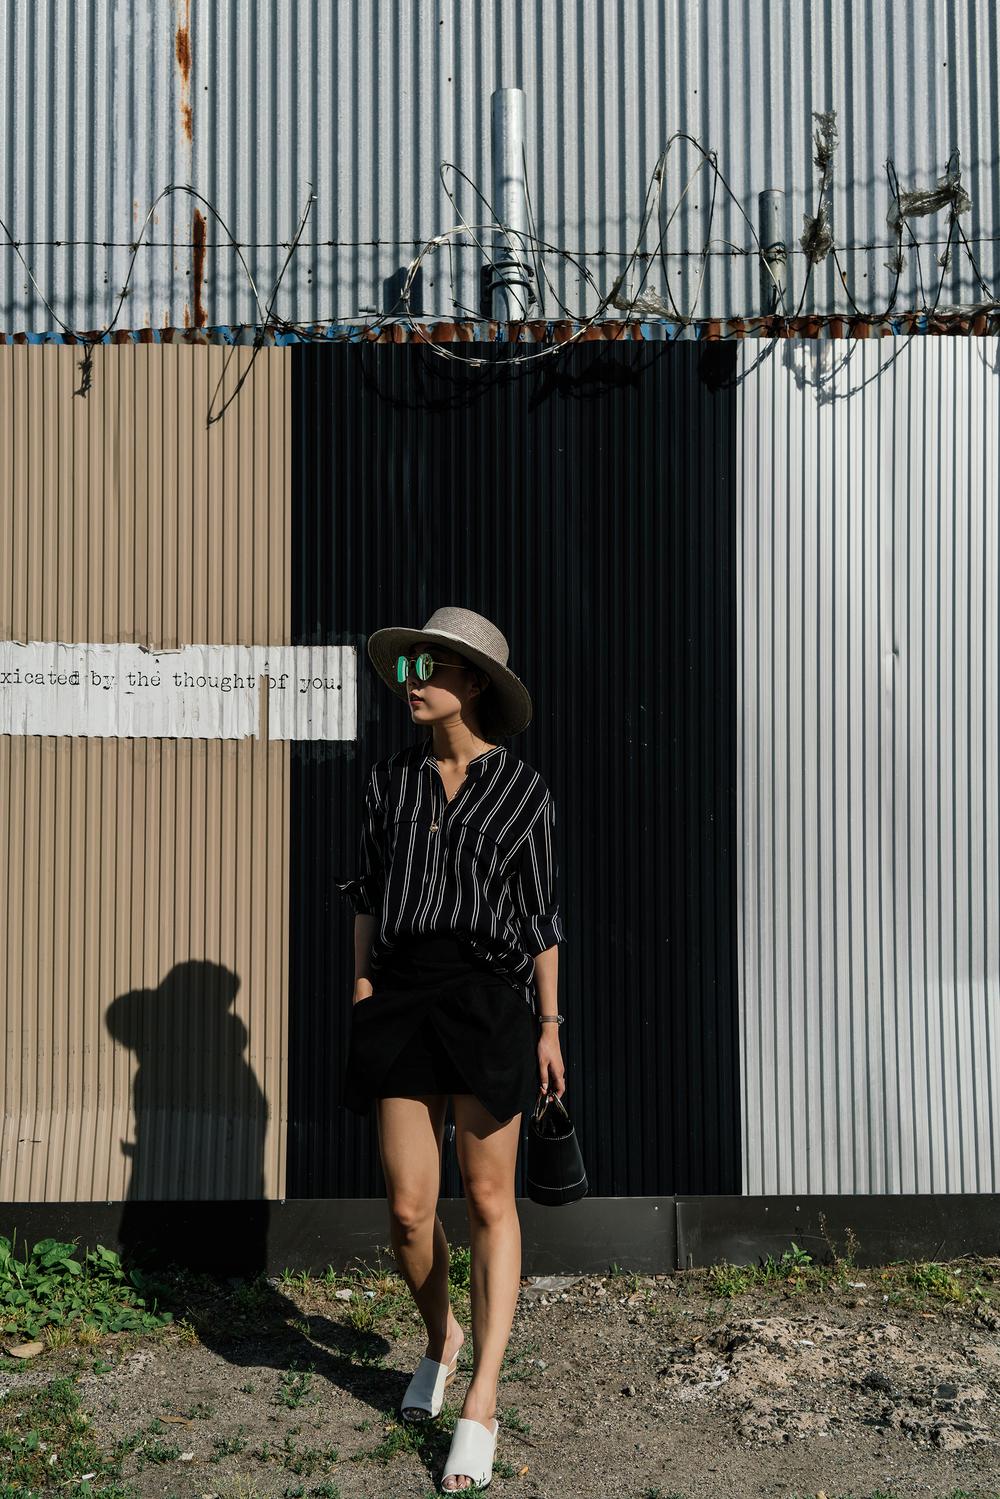 Tomorrowland Top, Isabel Marant Skirt, Dear Frances Sandals, Simon Miller Bag, Gentle Monster Sunglasses, Janessa Leone Hat